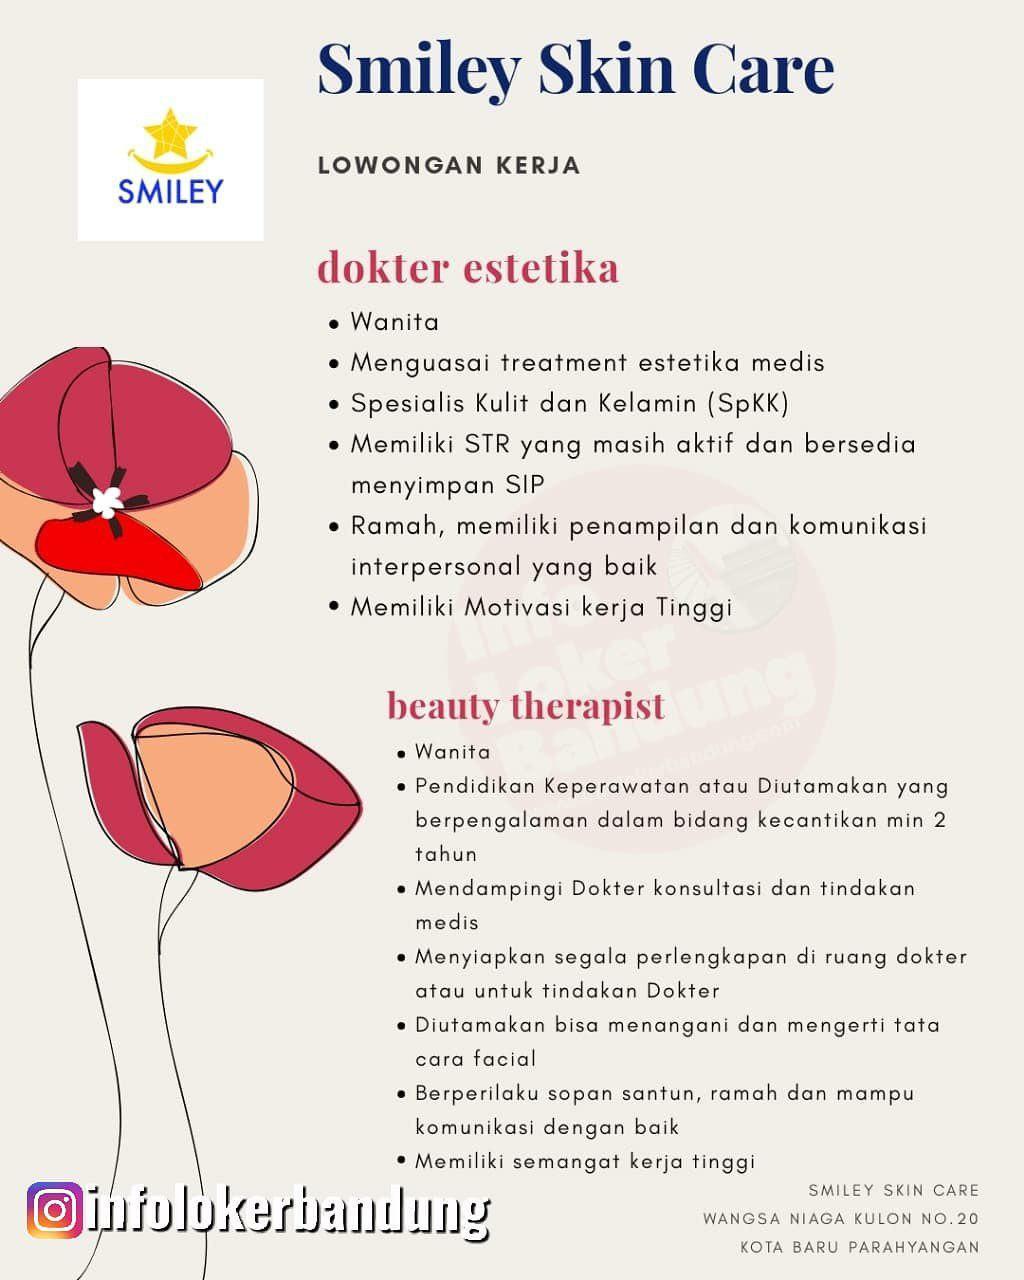 Lowongan Kerja Dokter Estetika & Beauty Therapist Smiley Skin Care Bandung November 2019